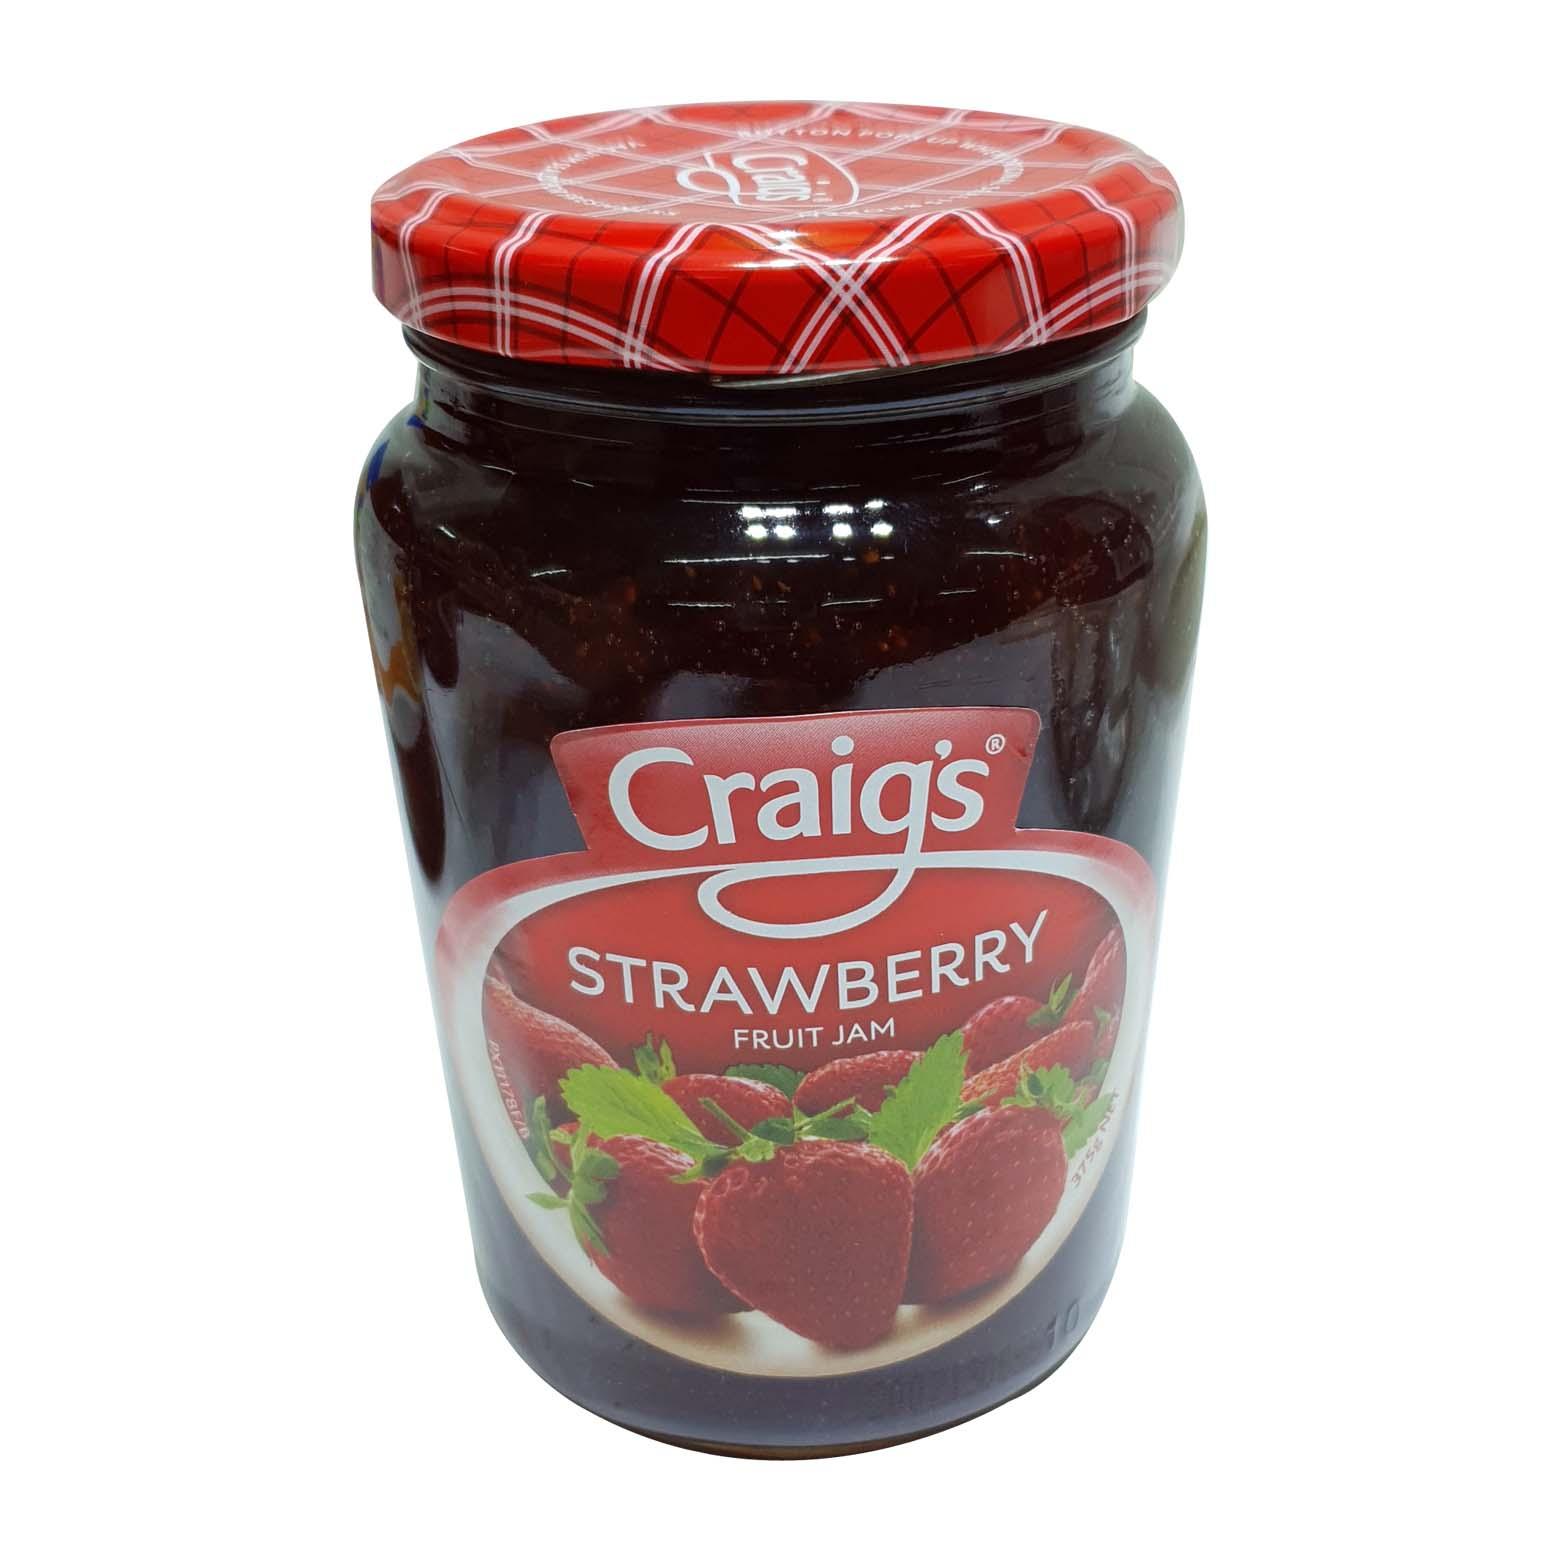 Craigs Strawberry Fruit Jam 375g